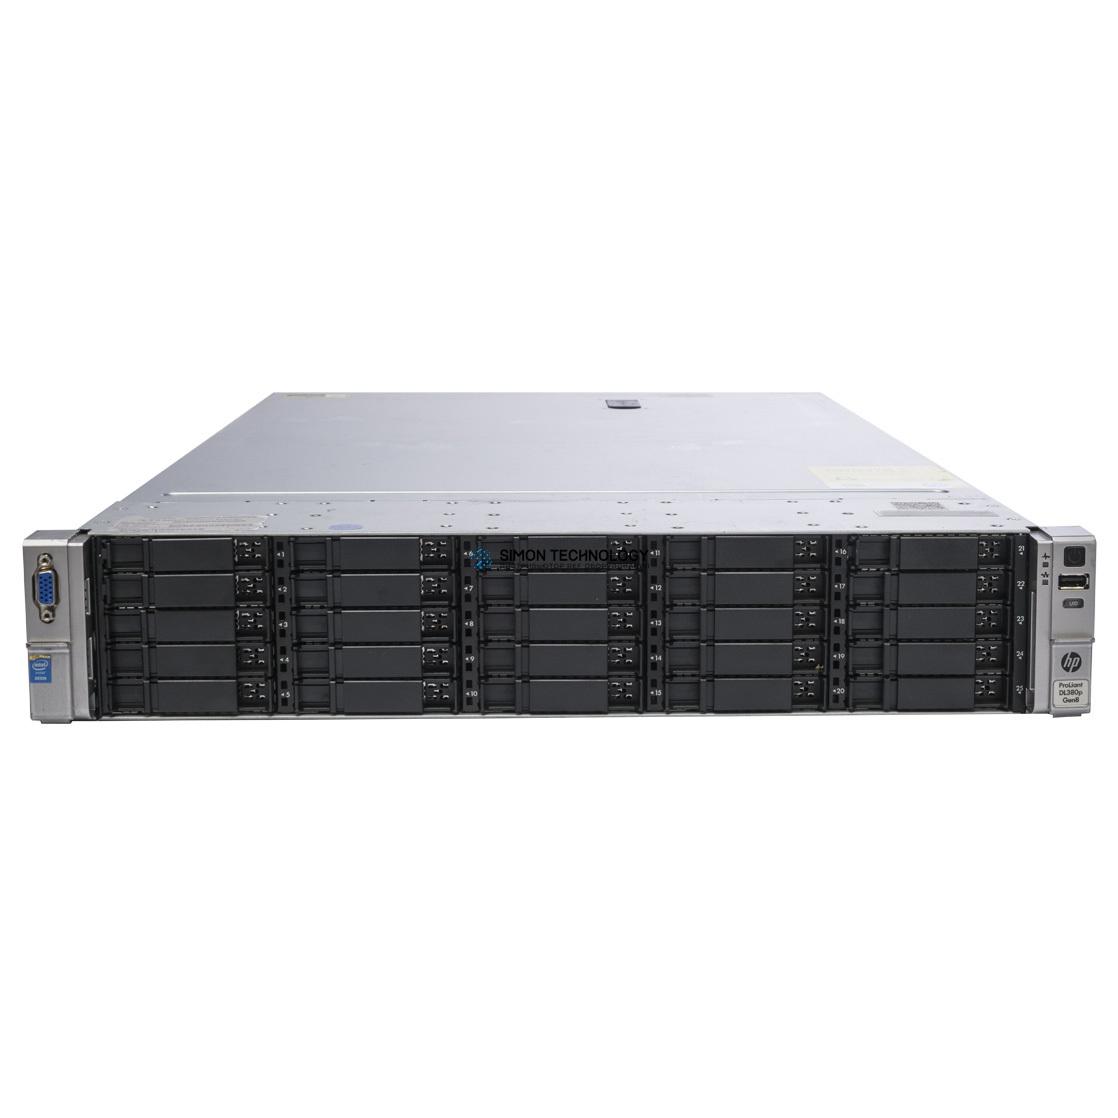 Сервер HP SERVER 25 SLOT 2.5 INCH, 2X HEAT SINK, RISER (704558-001)